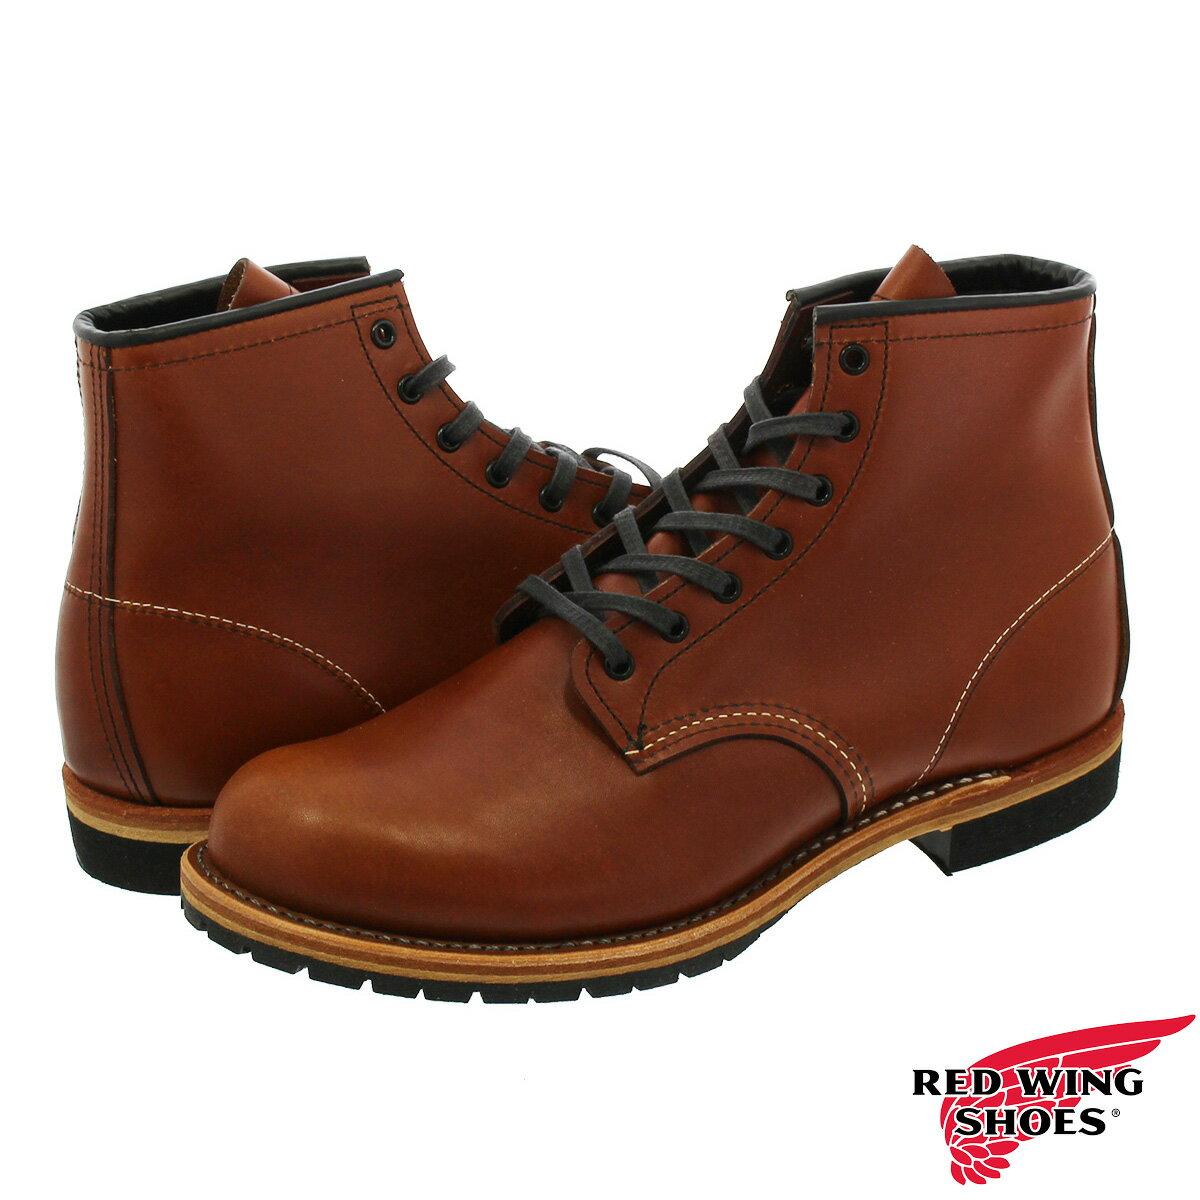 RED WING 9016 BECKMAN BOOT レッドウイング ベックマン ブーツ CIGAR